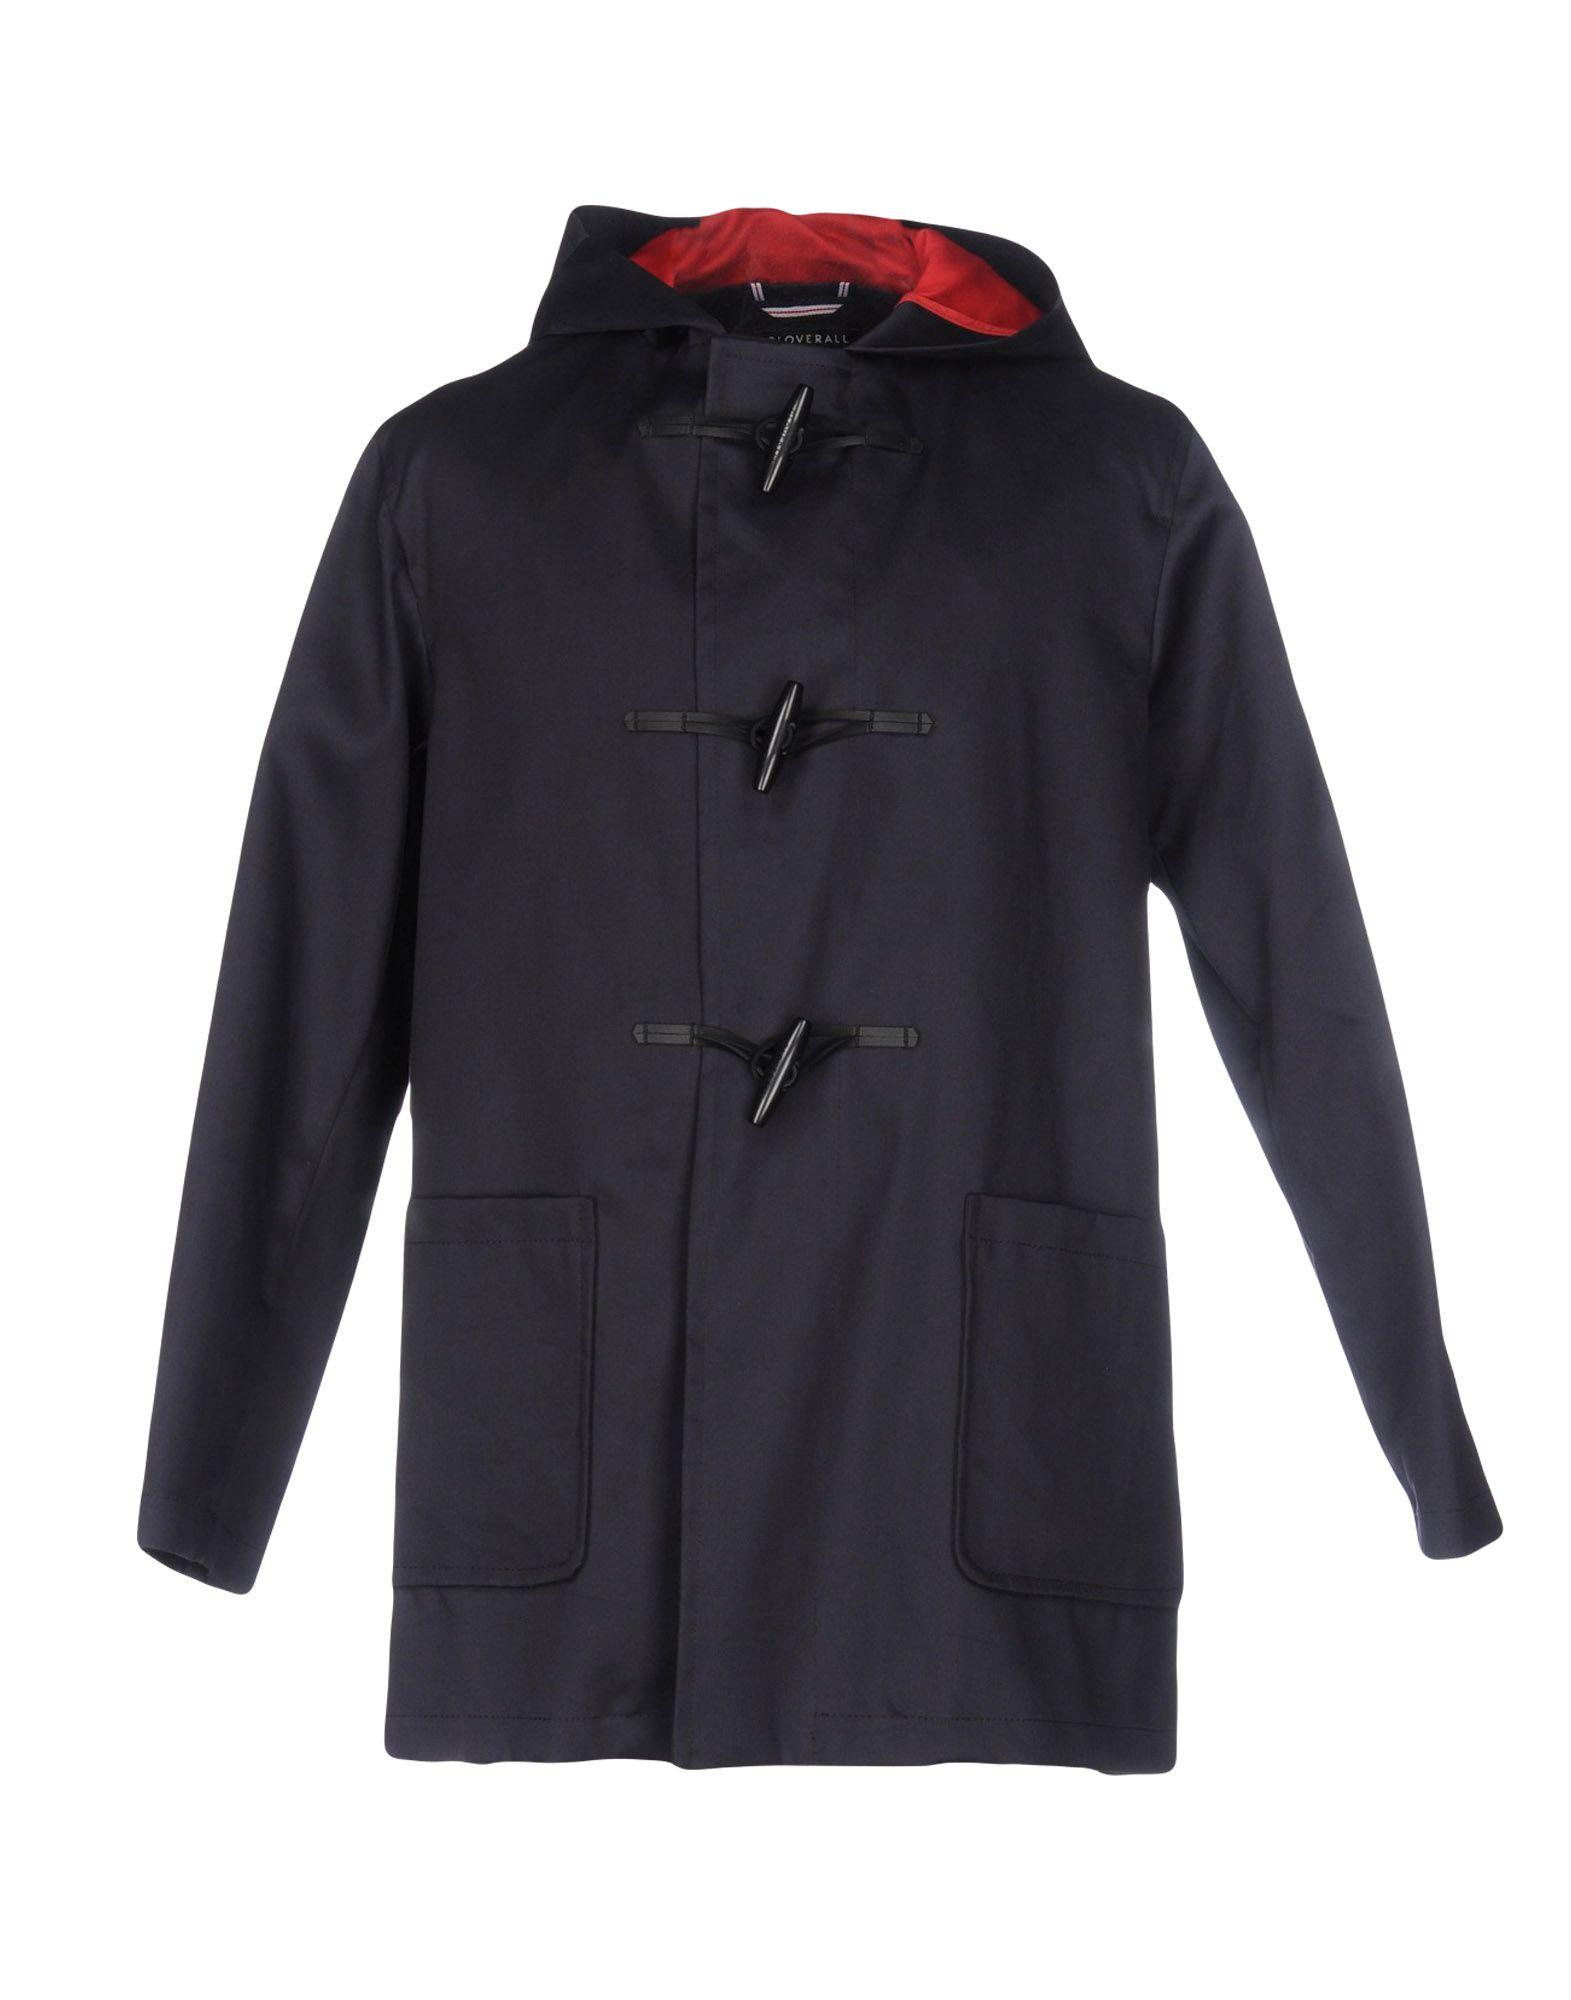 Gloverall Wool Duffle Coats for Men - Gloverall Coats & Jackets   YOOX